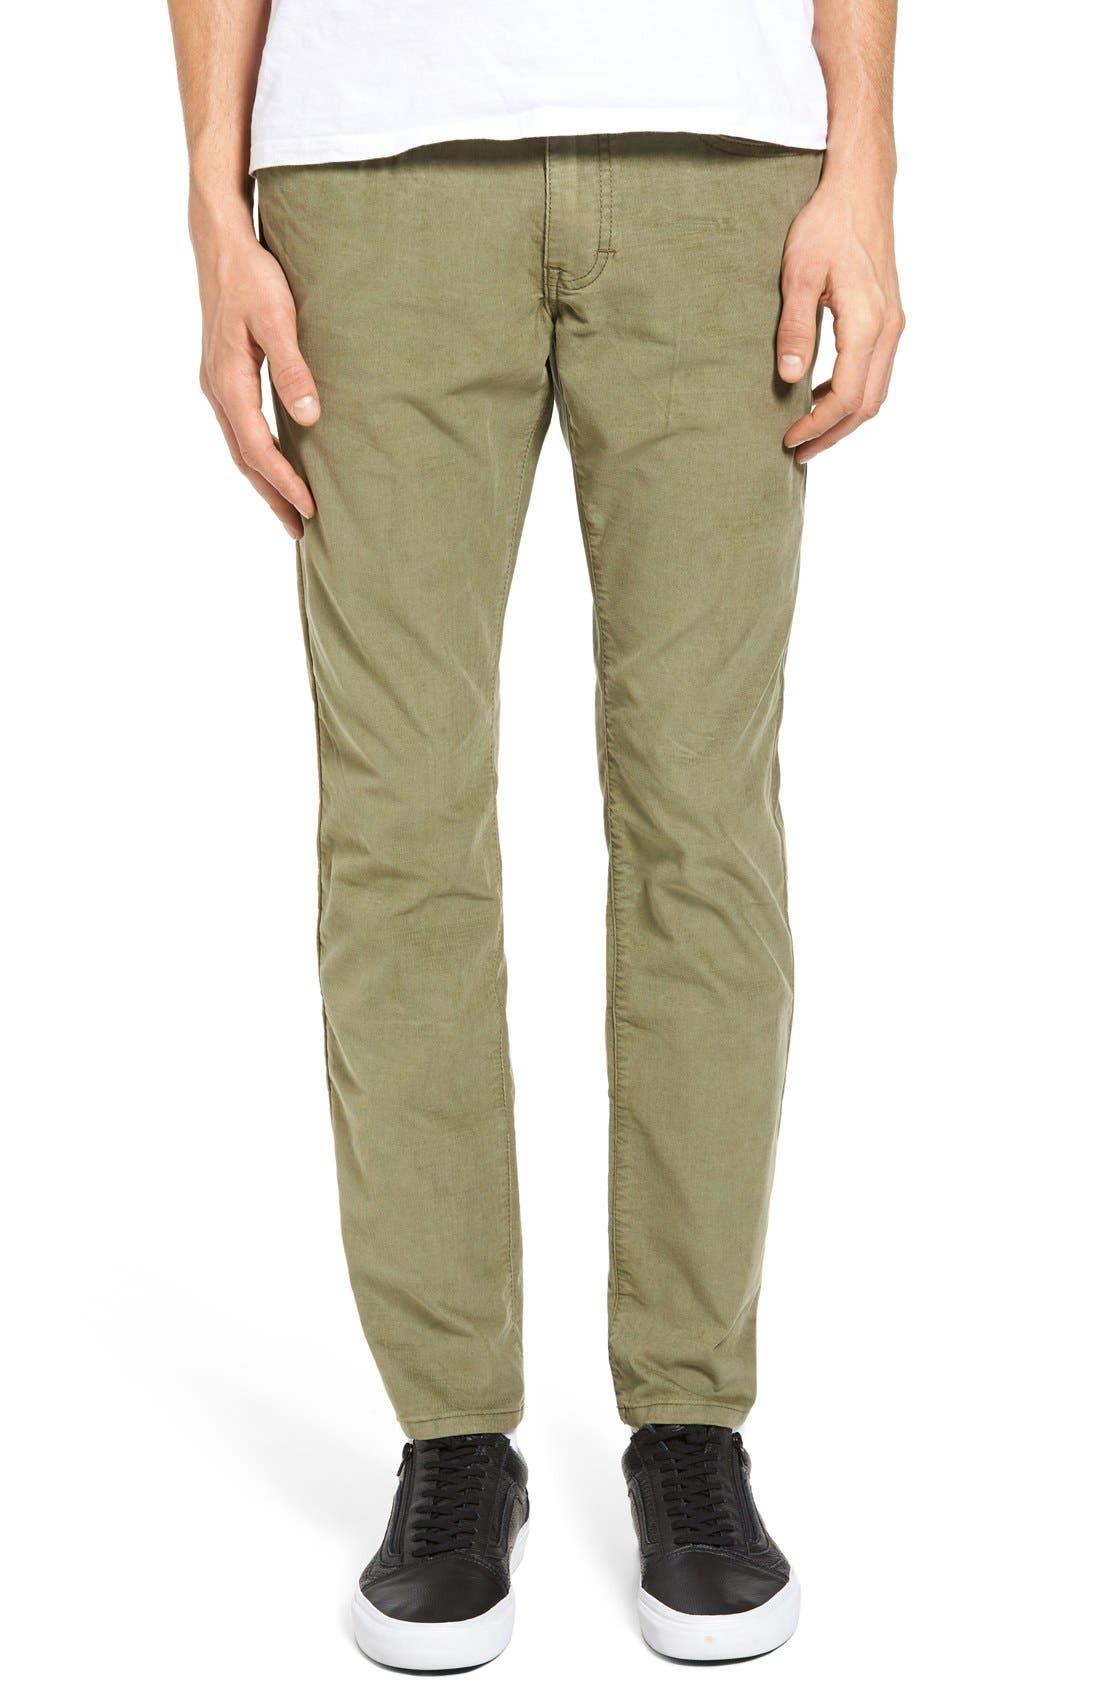 Bryce Chopper Slim Fit Corduroy Pants,                         Main,                         color, Olive